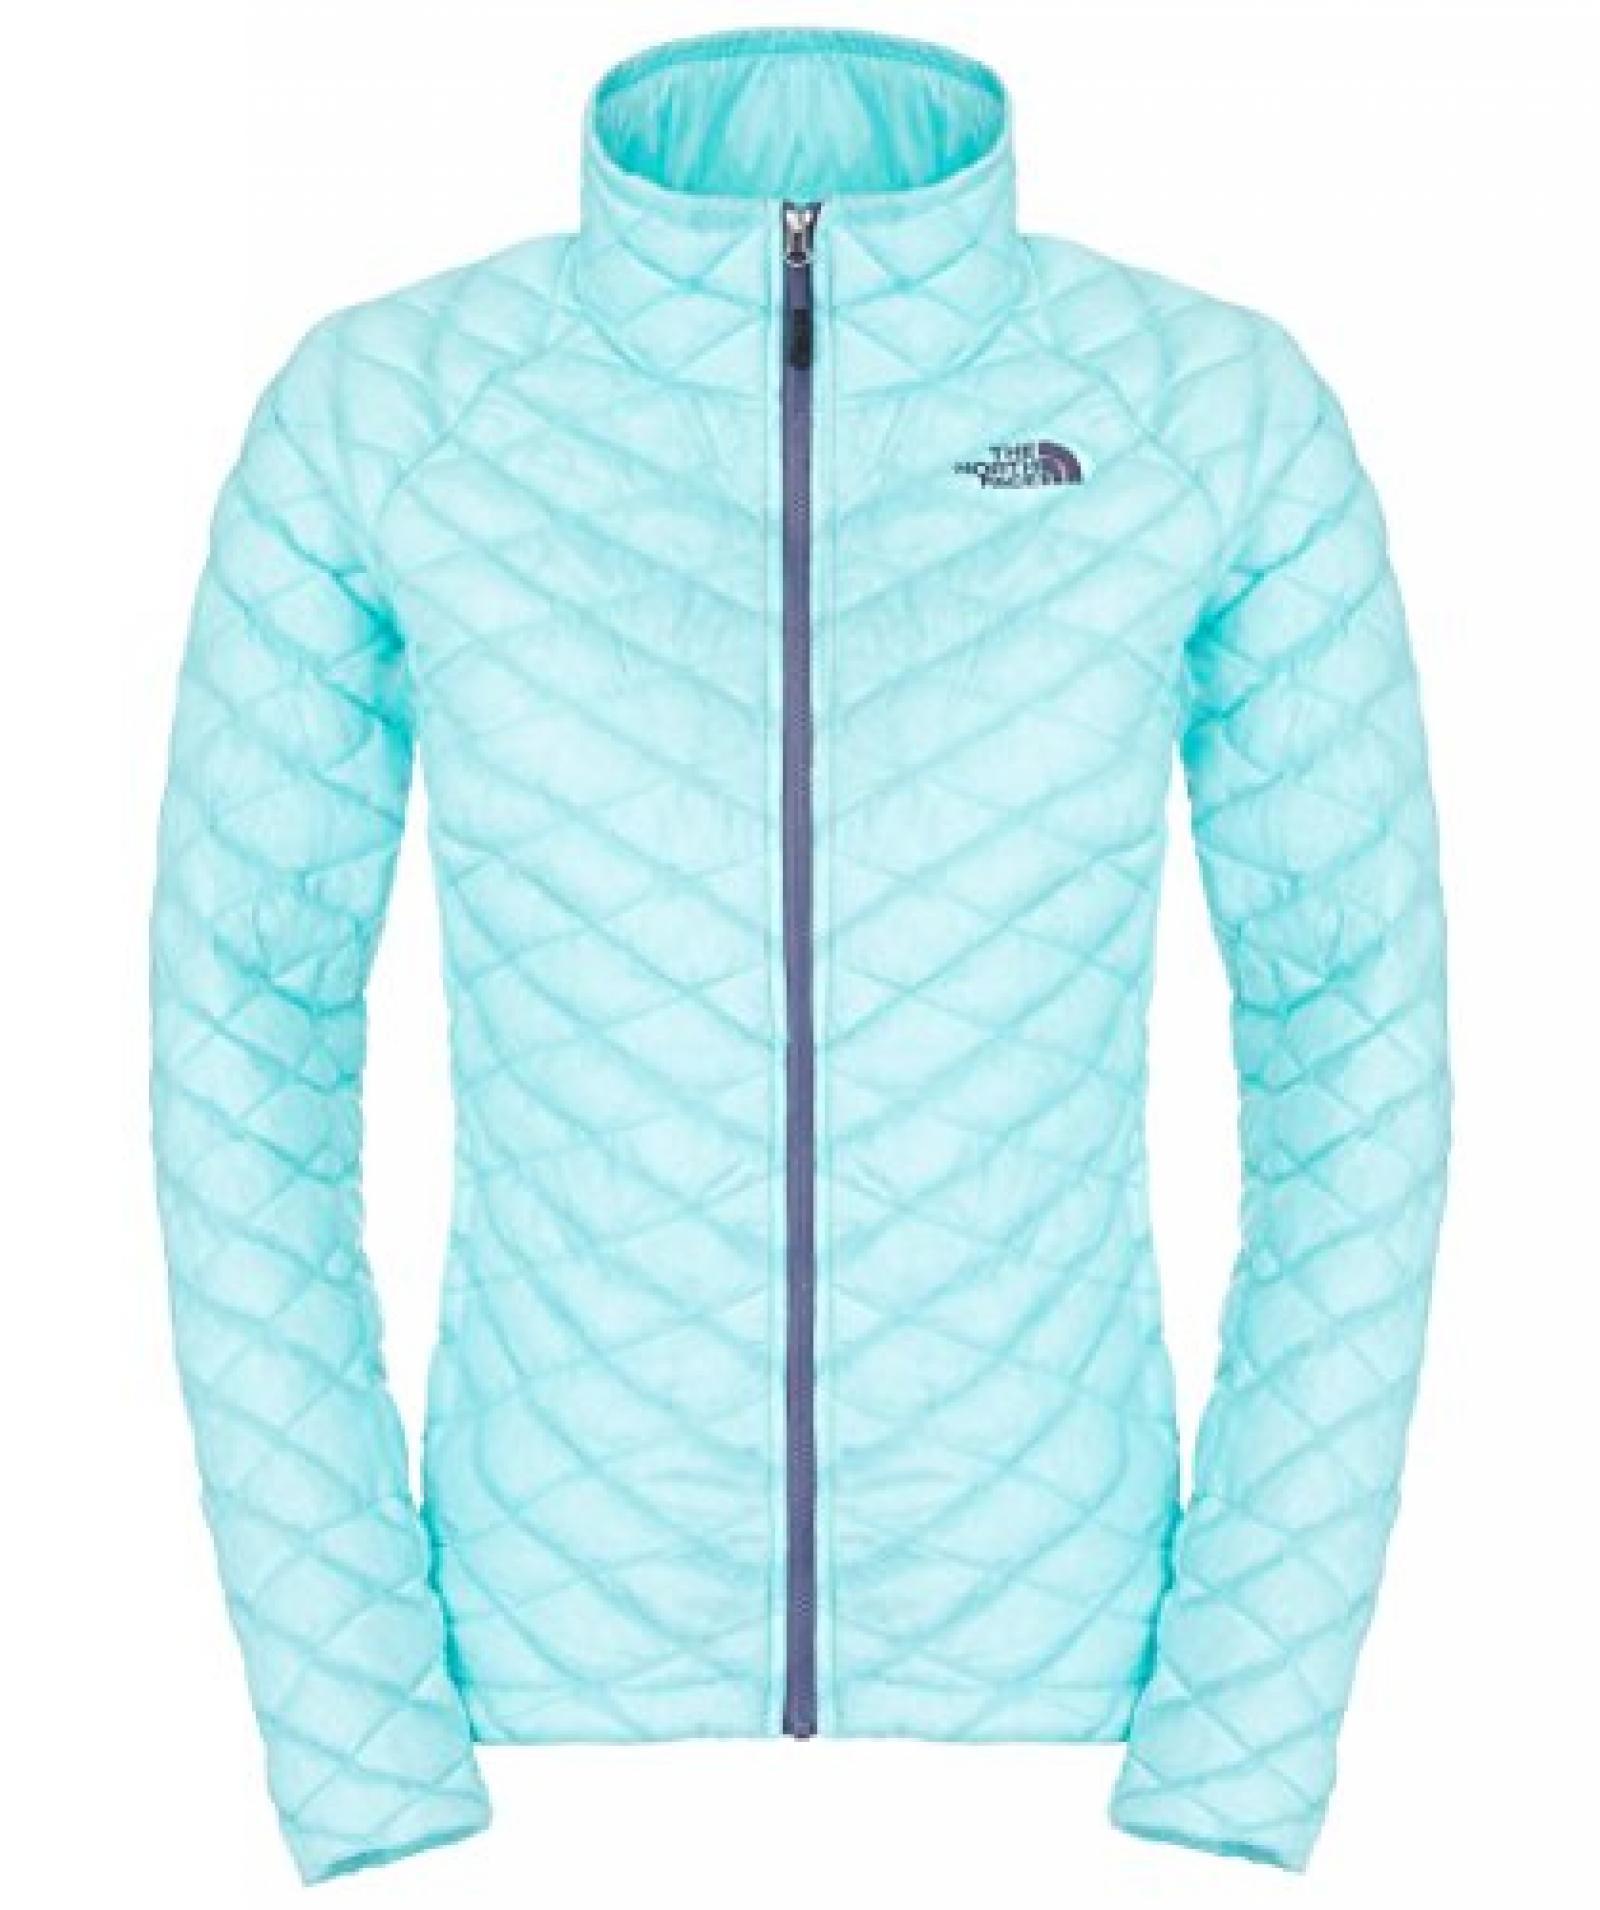 Damen Outdoor-Isolationsjacke/ Steppjacke Thermoball Full Zip Jacket W